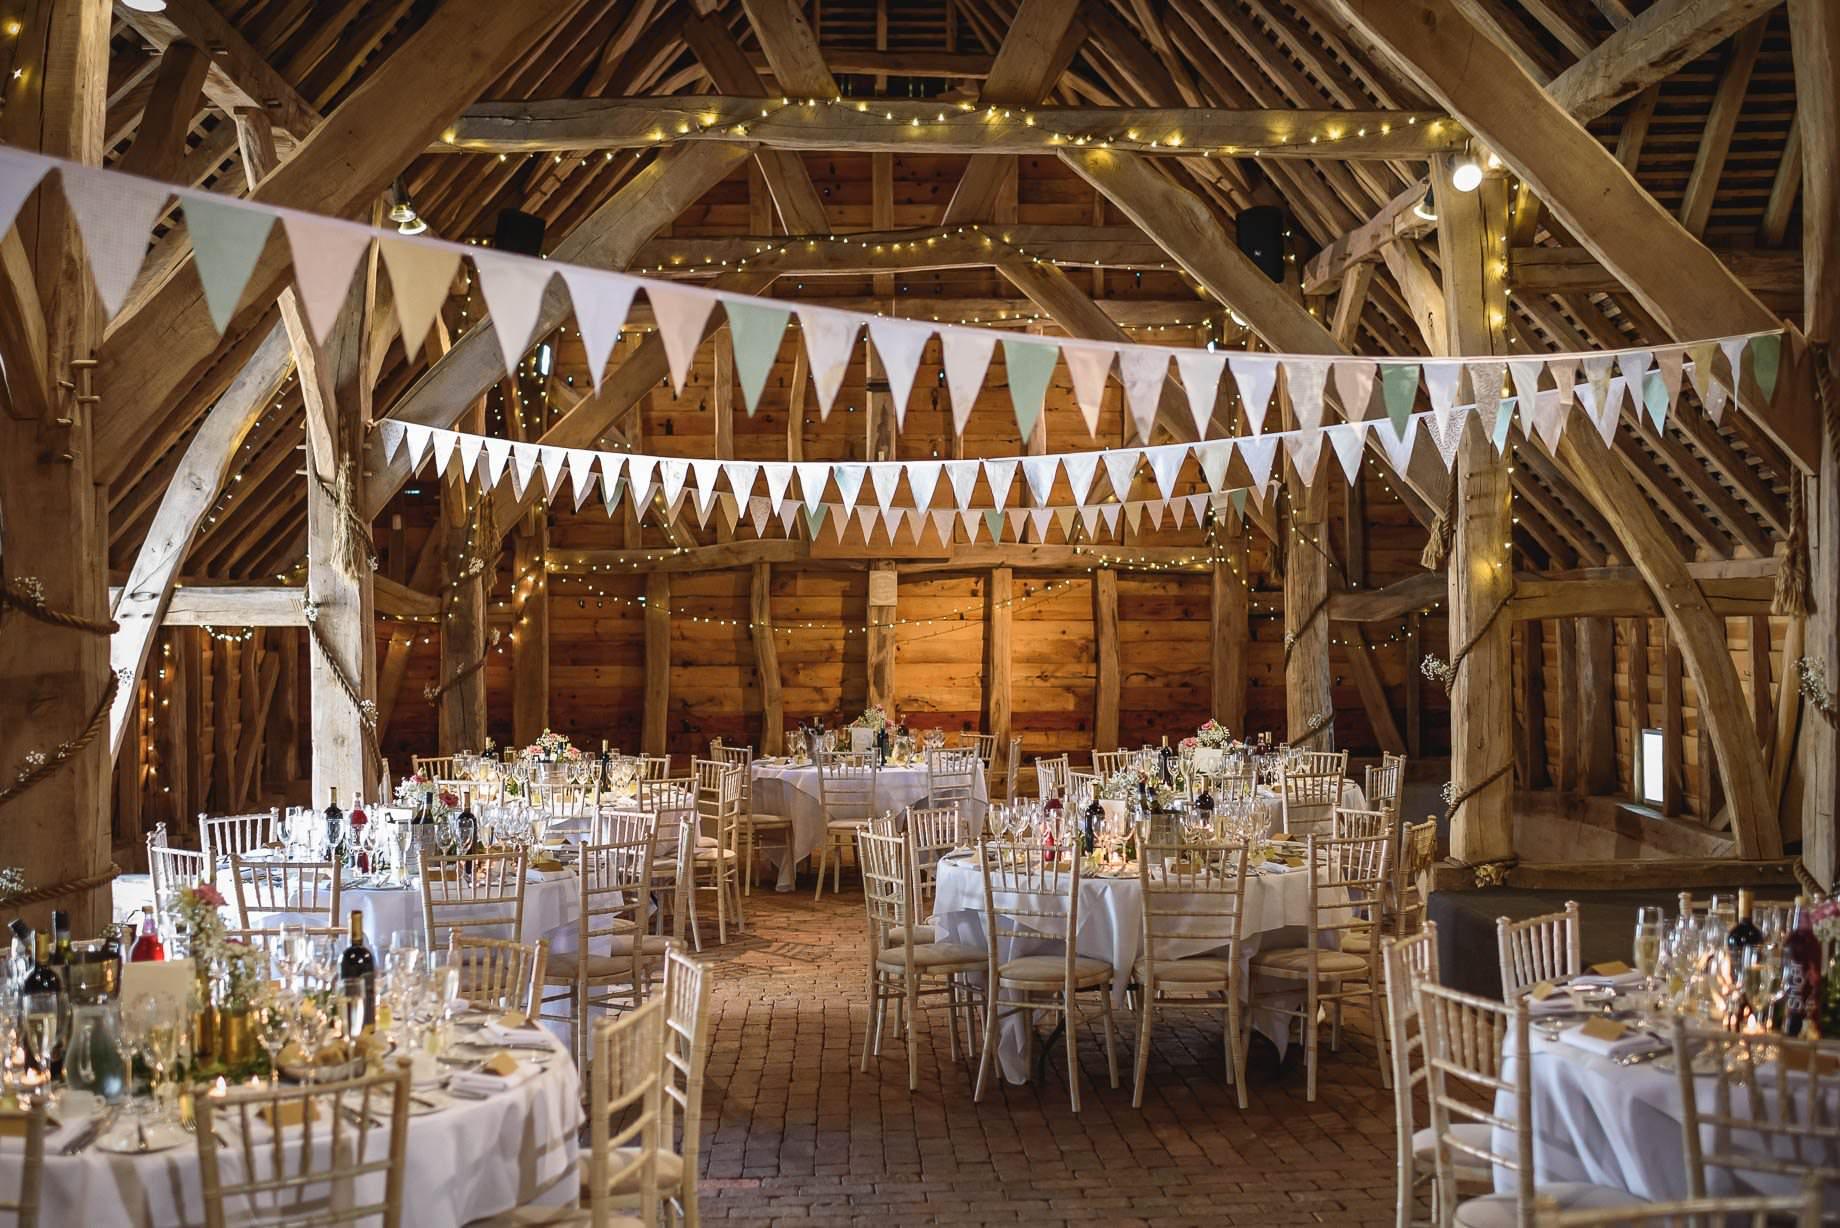 Gildings Barn wedding photography - Sarah and Steve (125 of 190)